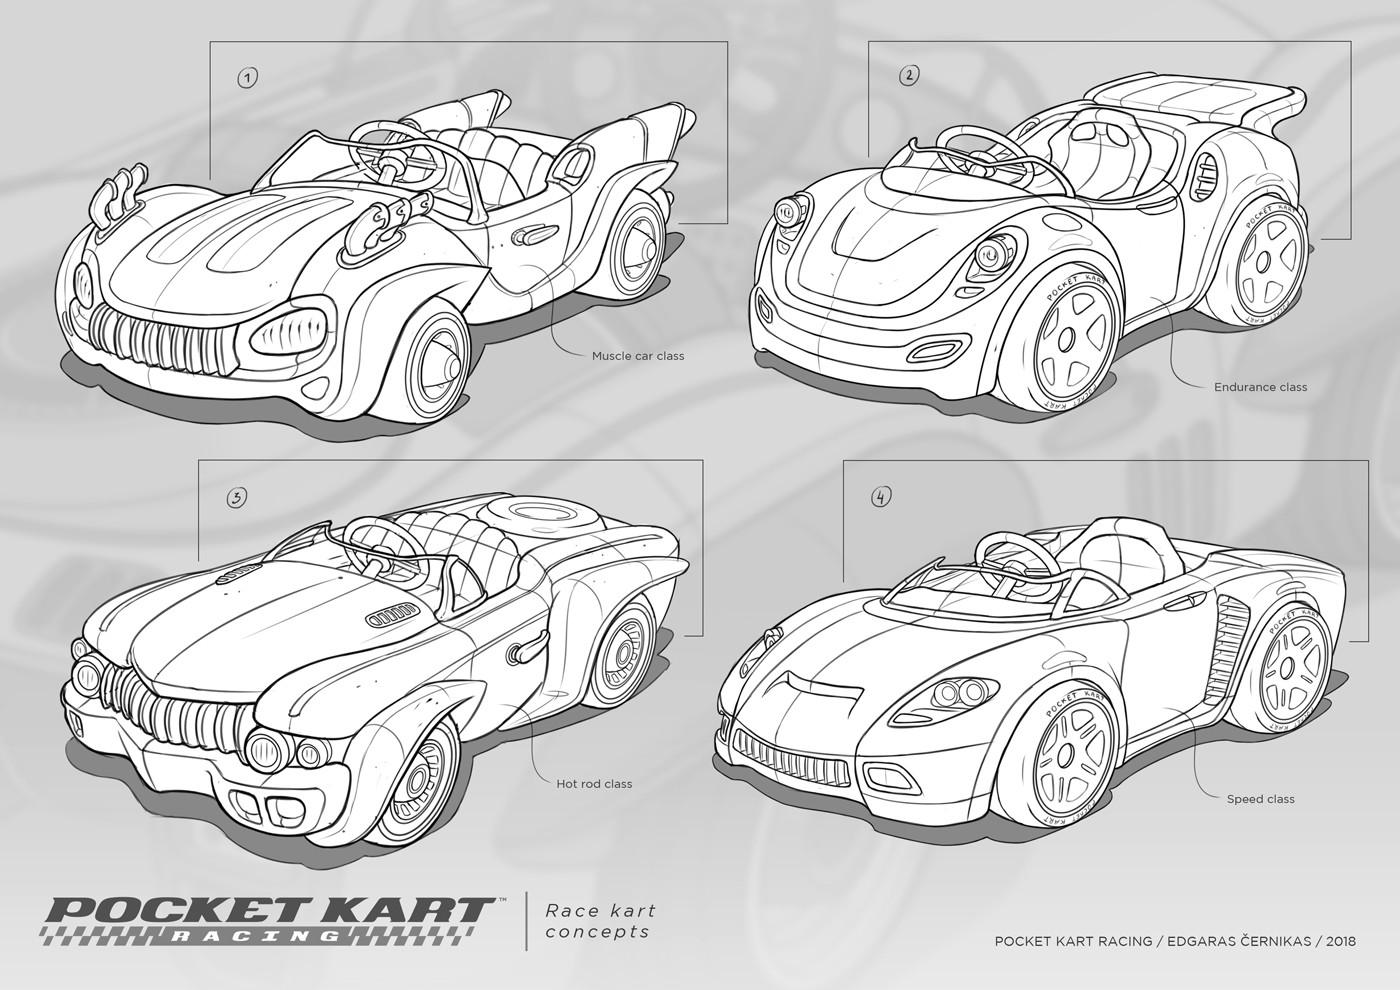 Edgaras cernikas pocket kart race kart concepts 1400x990